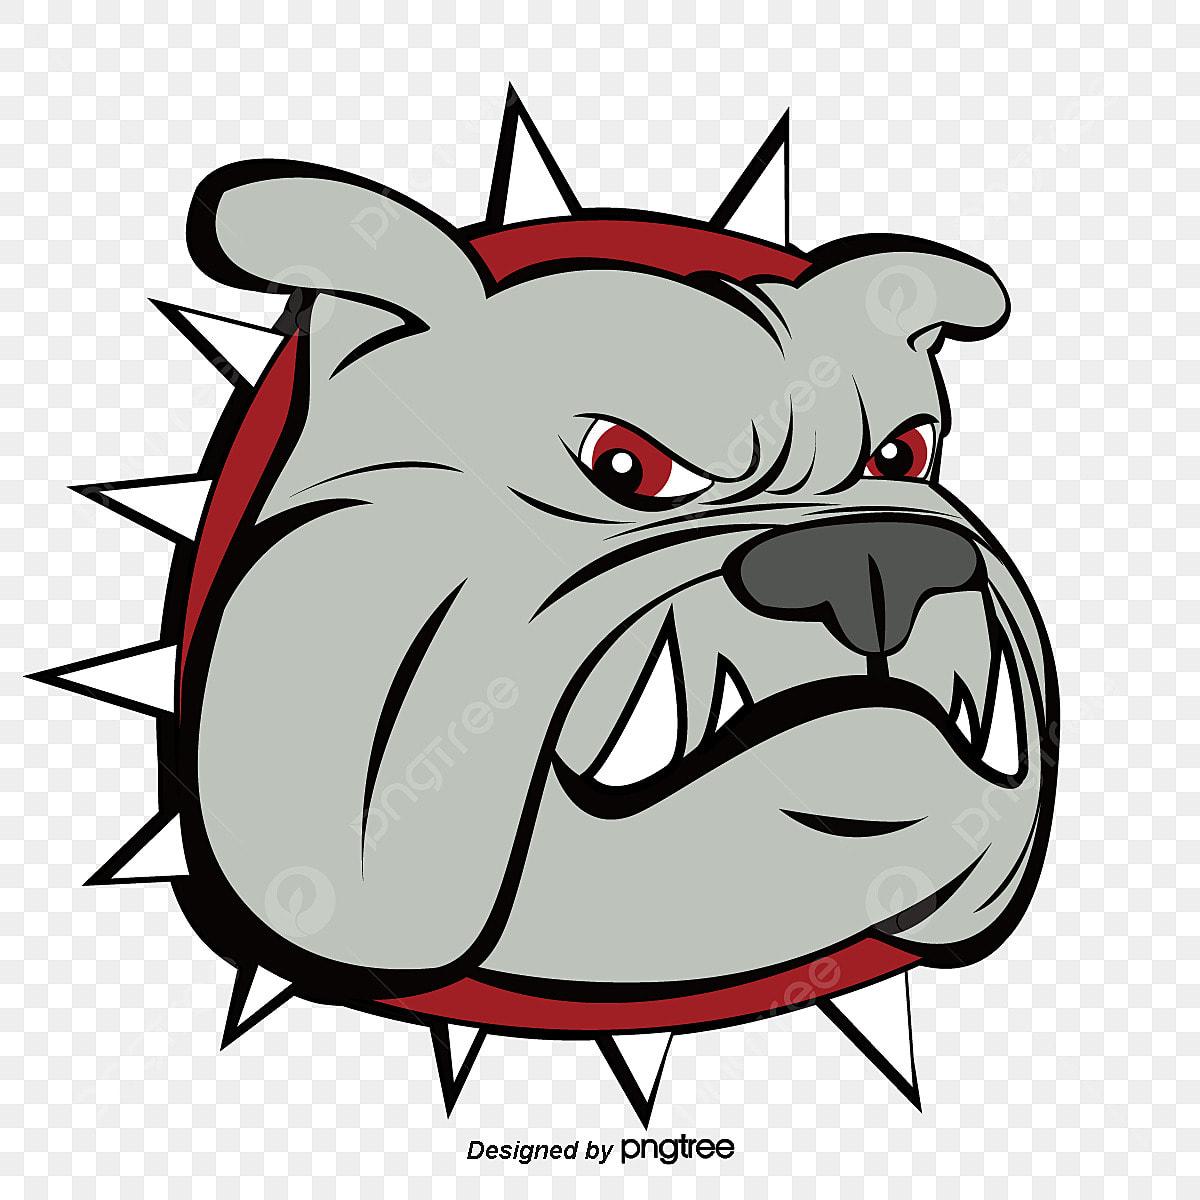 le bulldog de dessin anim u00e9 de la t u00eate bulldog chiens de la